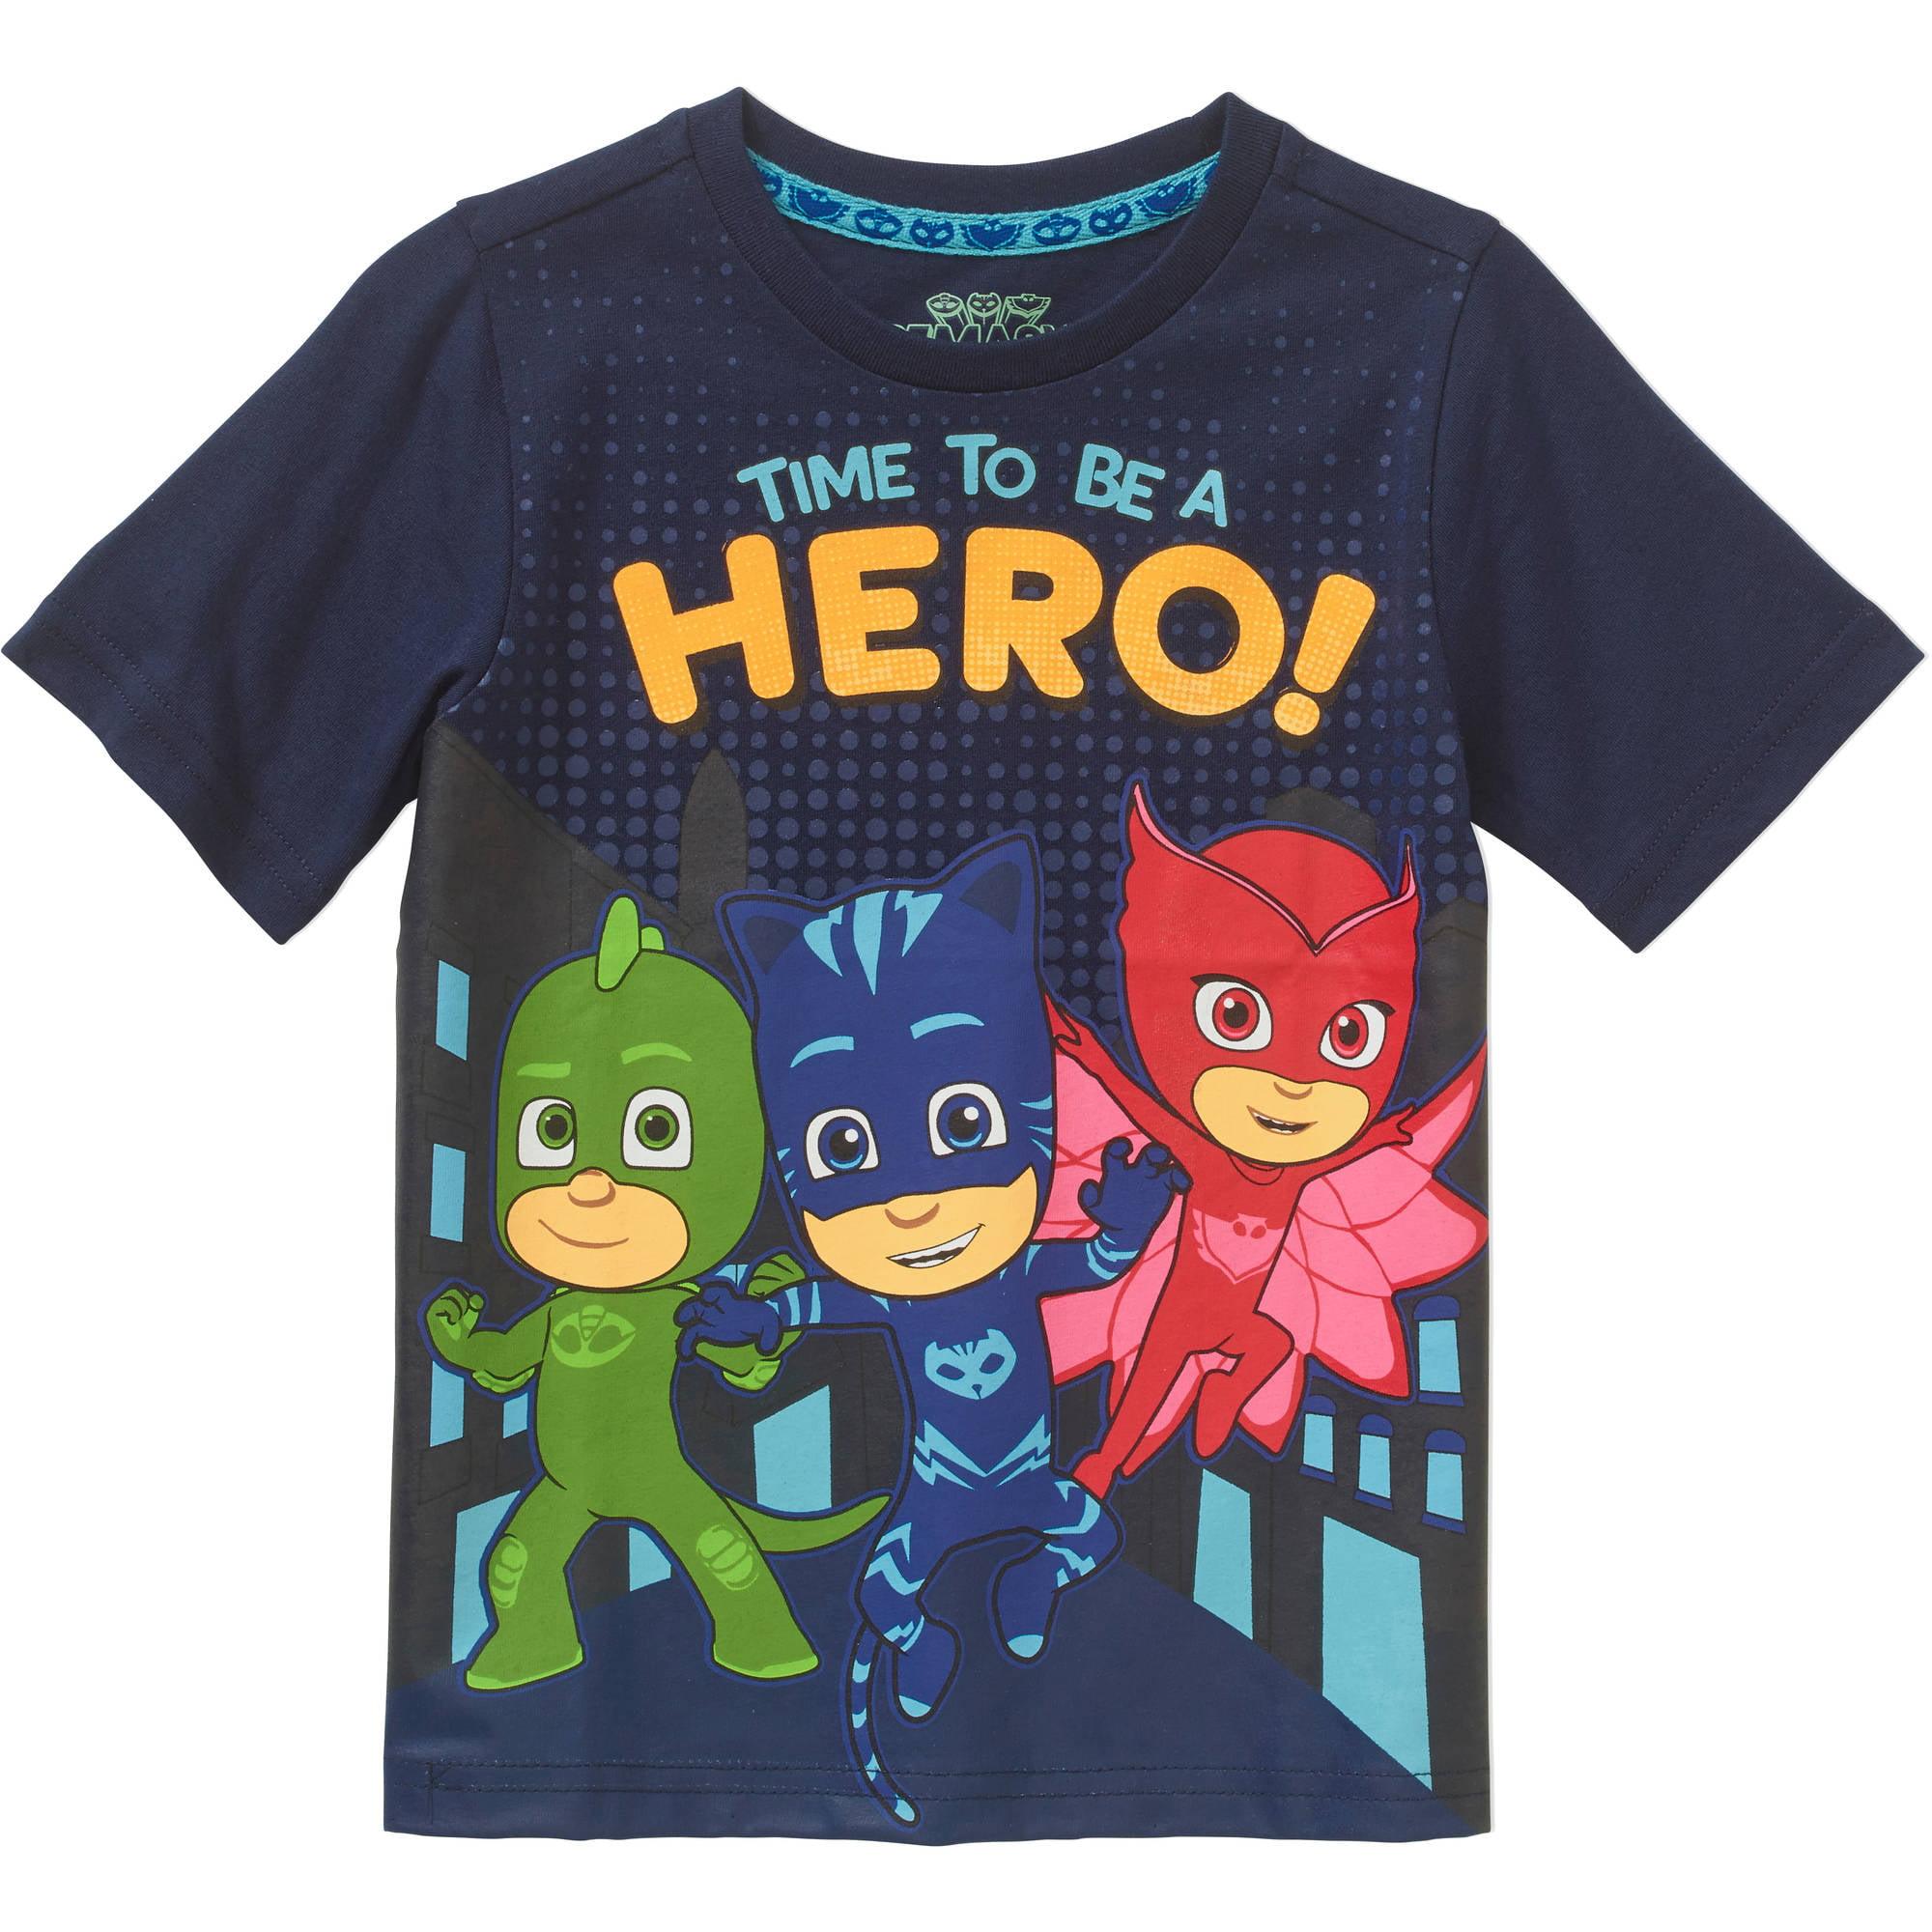 0681b319d PJ Masks - Toddler Boys' Short Sleeve Hero T-Shirt - Walmart.com